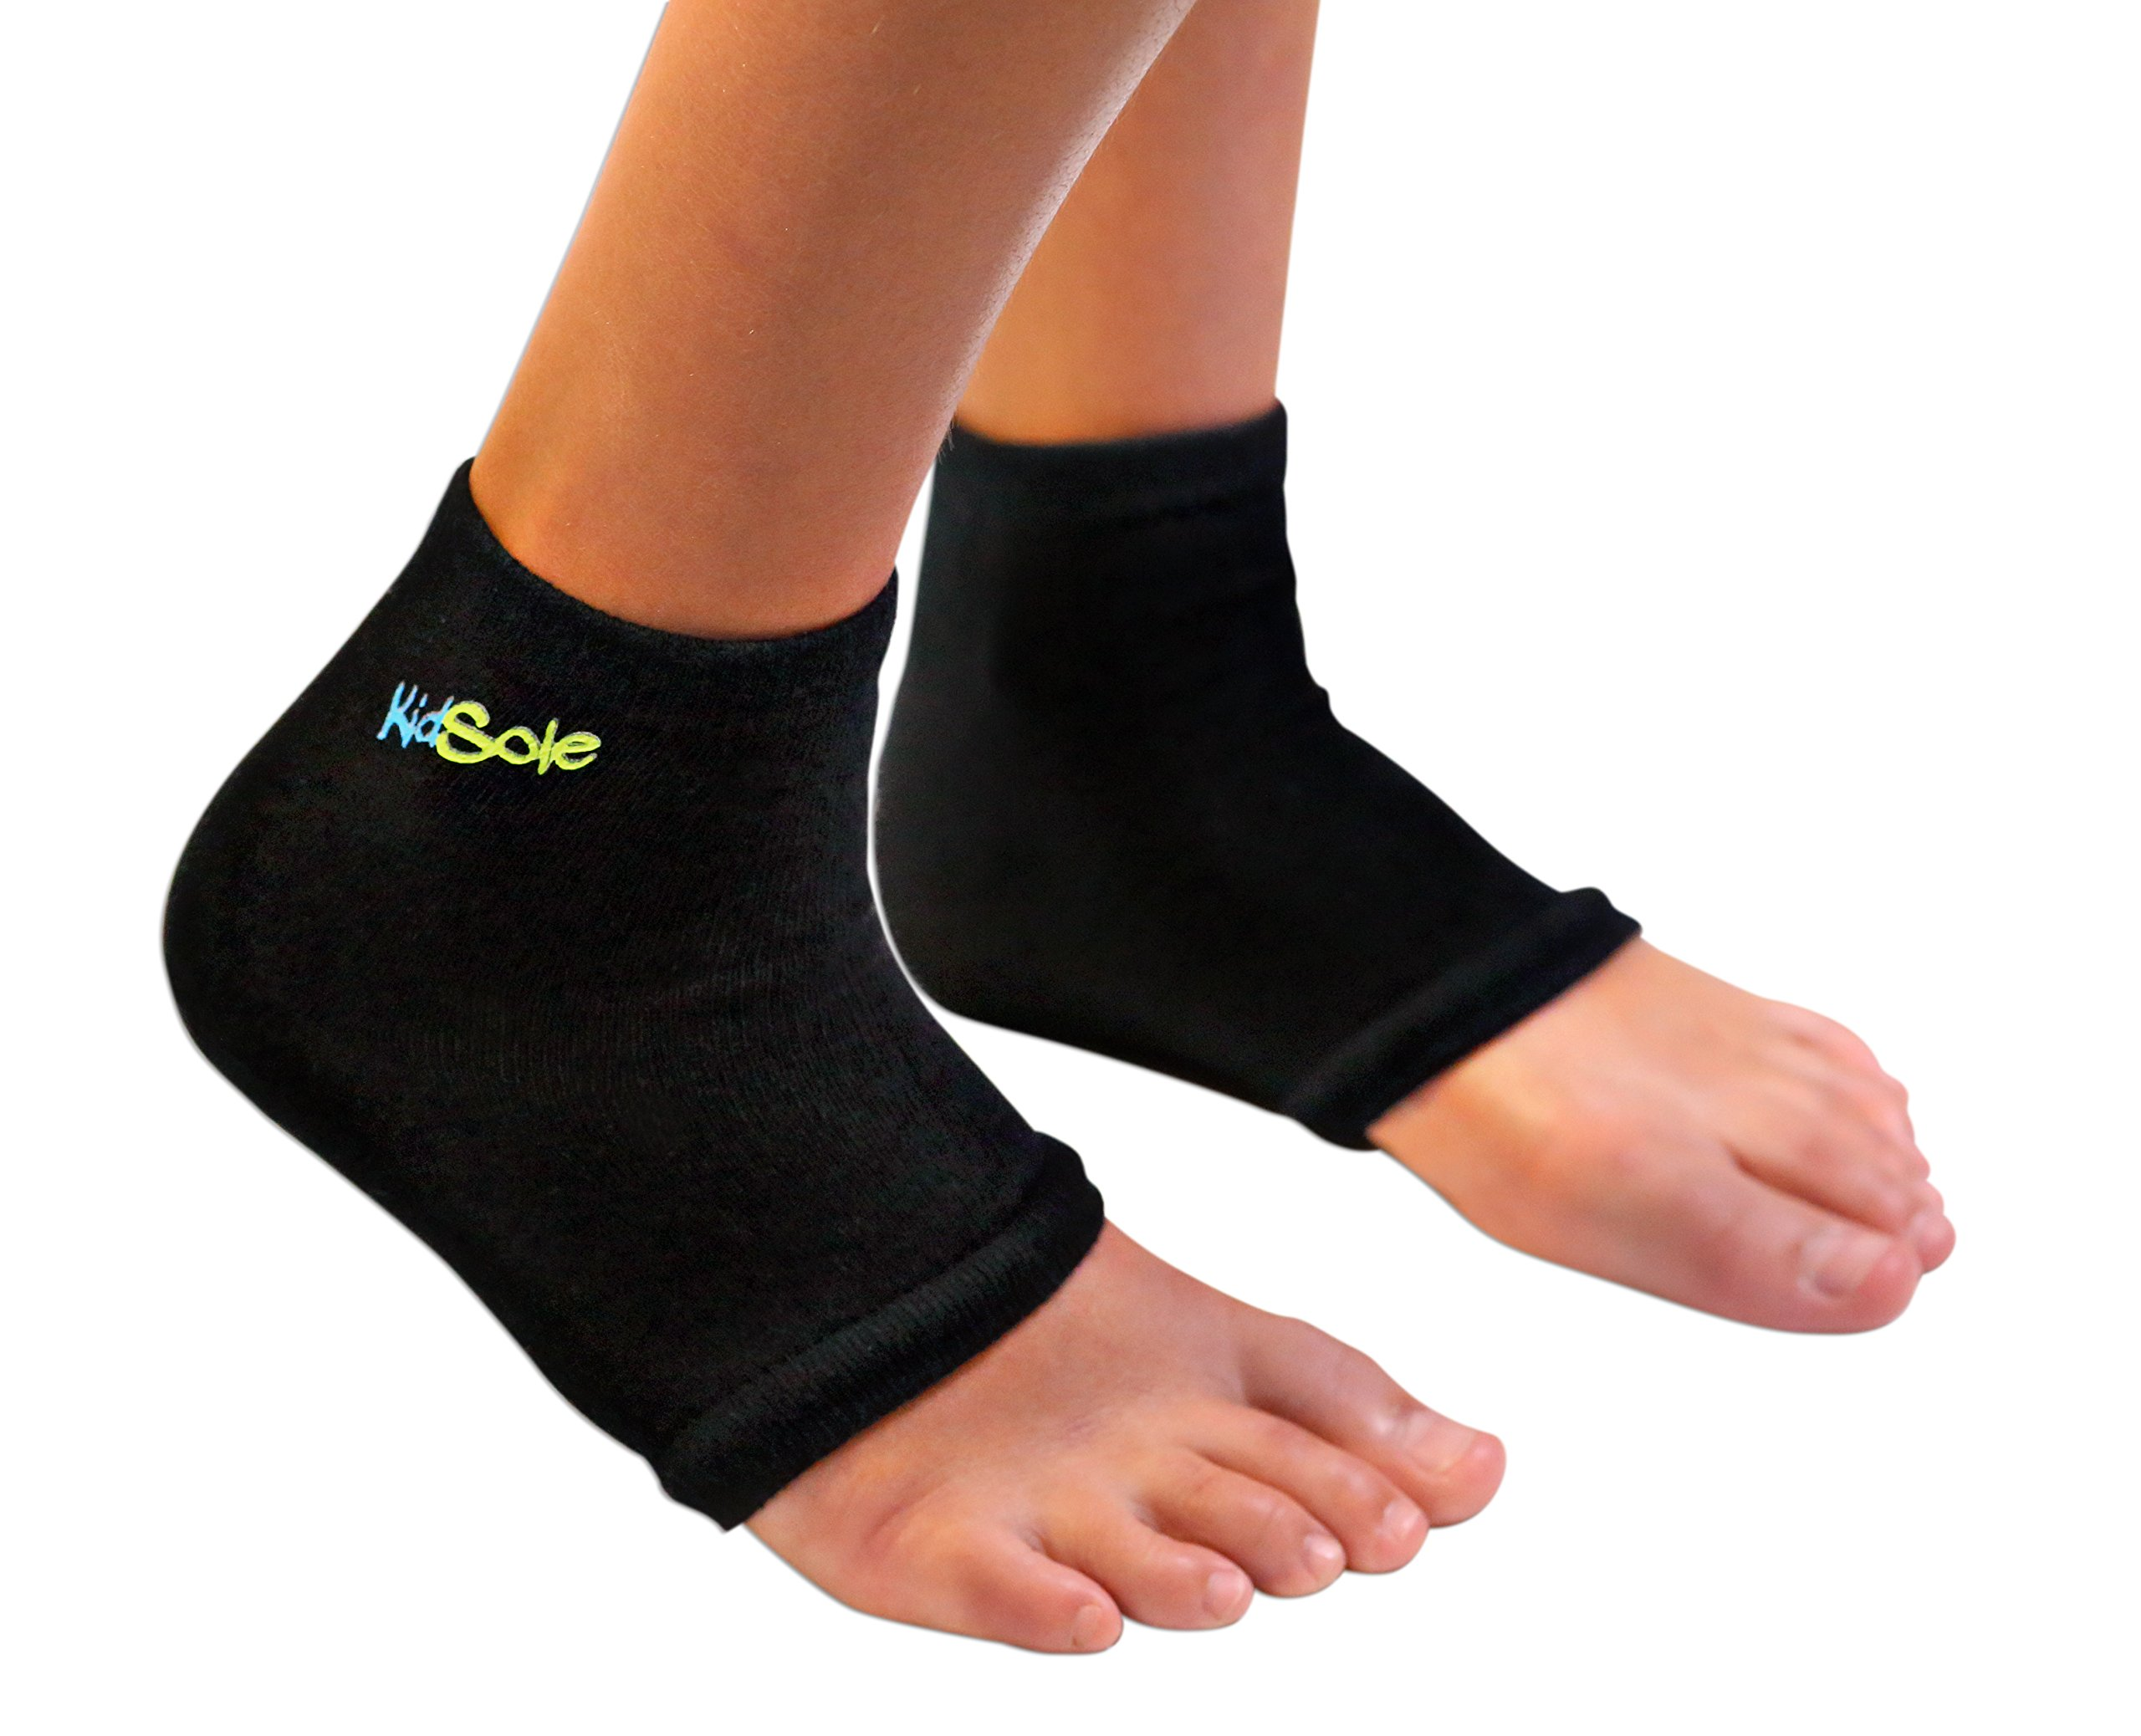 KidSole RX Gel Sports Sock for Kids with Heel Sensitivity from Severs Disease, Plantar Fasciitis. US Kid's Sizes 2-7 (Black) by KidSole